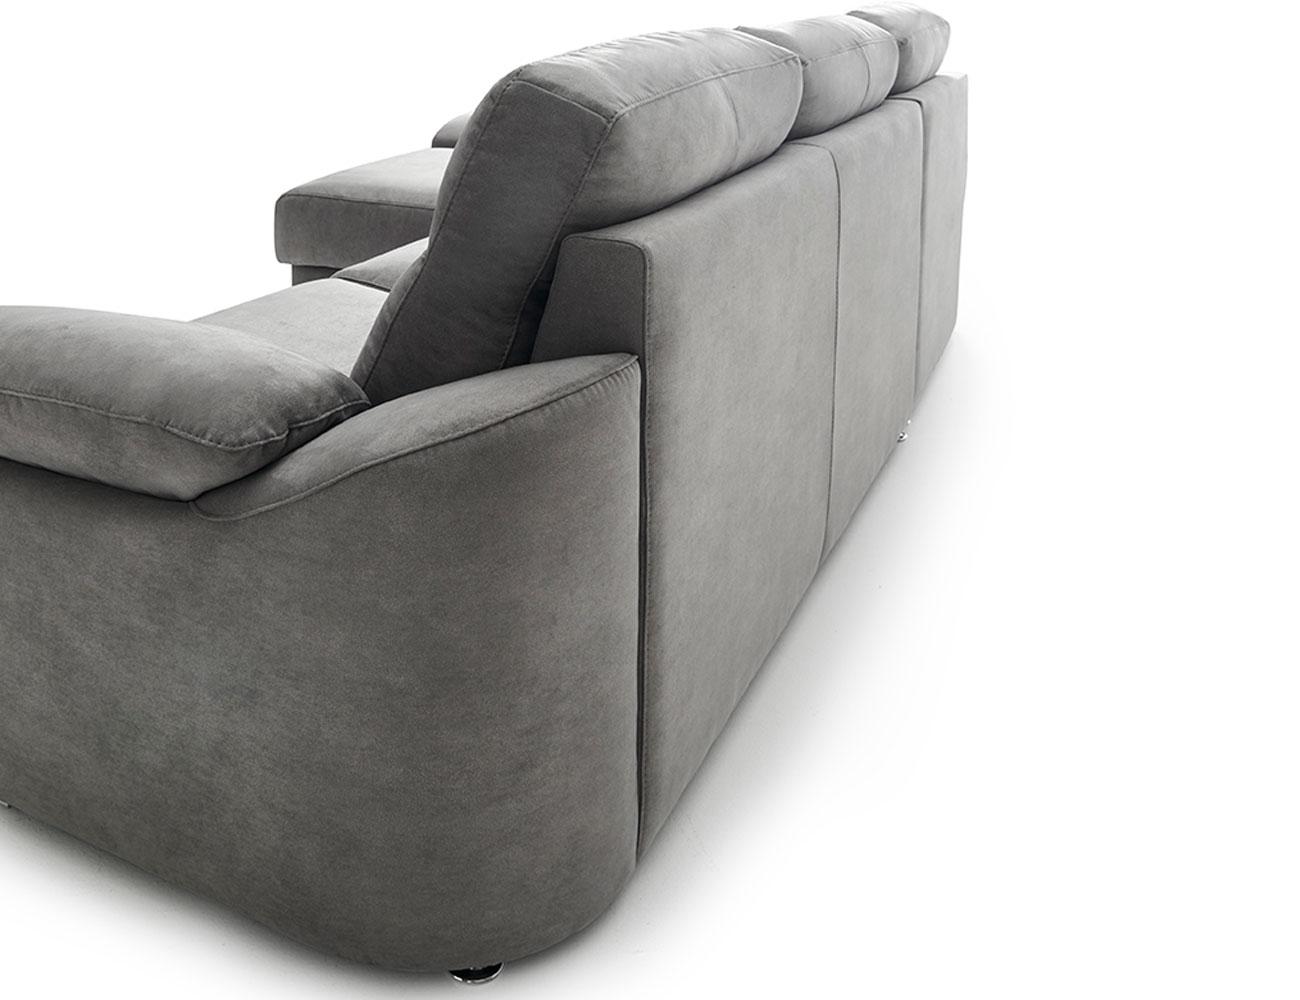 Sofa chaiselongue asientos viscolastica pedro ortiz 2